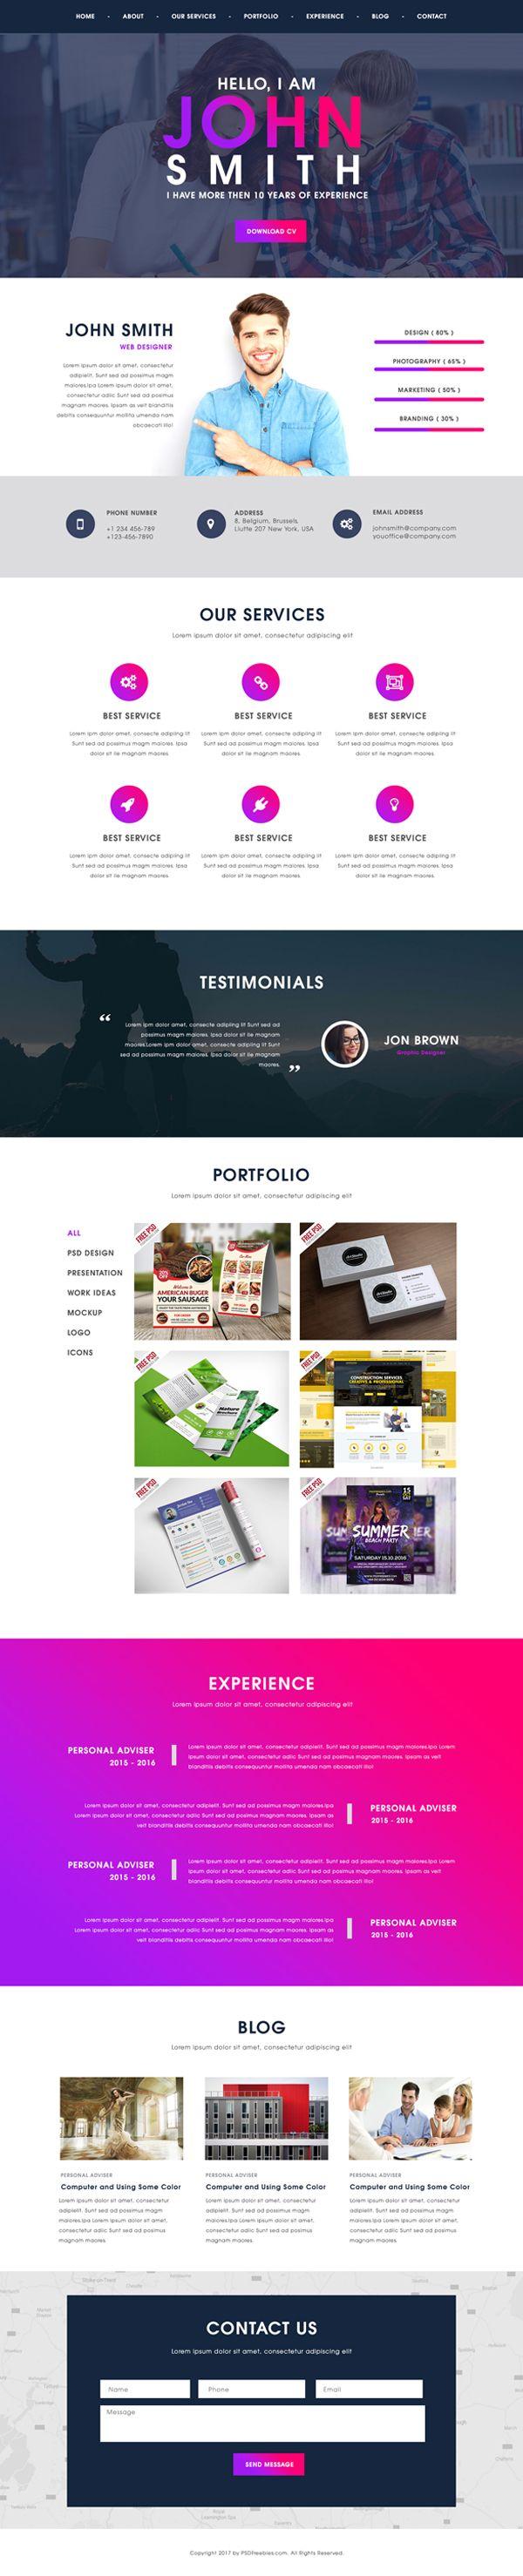 Web Templates 25 Professional Free Psd Templates Portfolio Layout Design